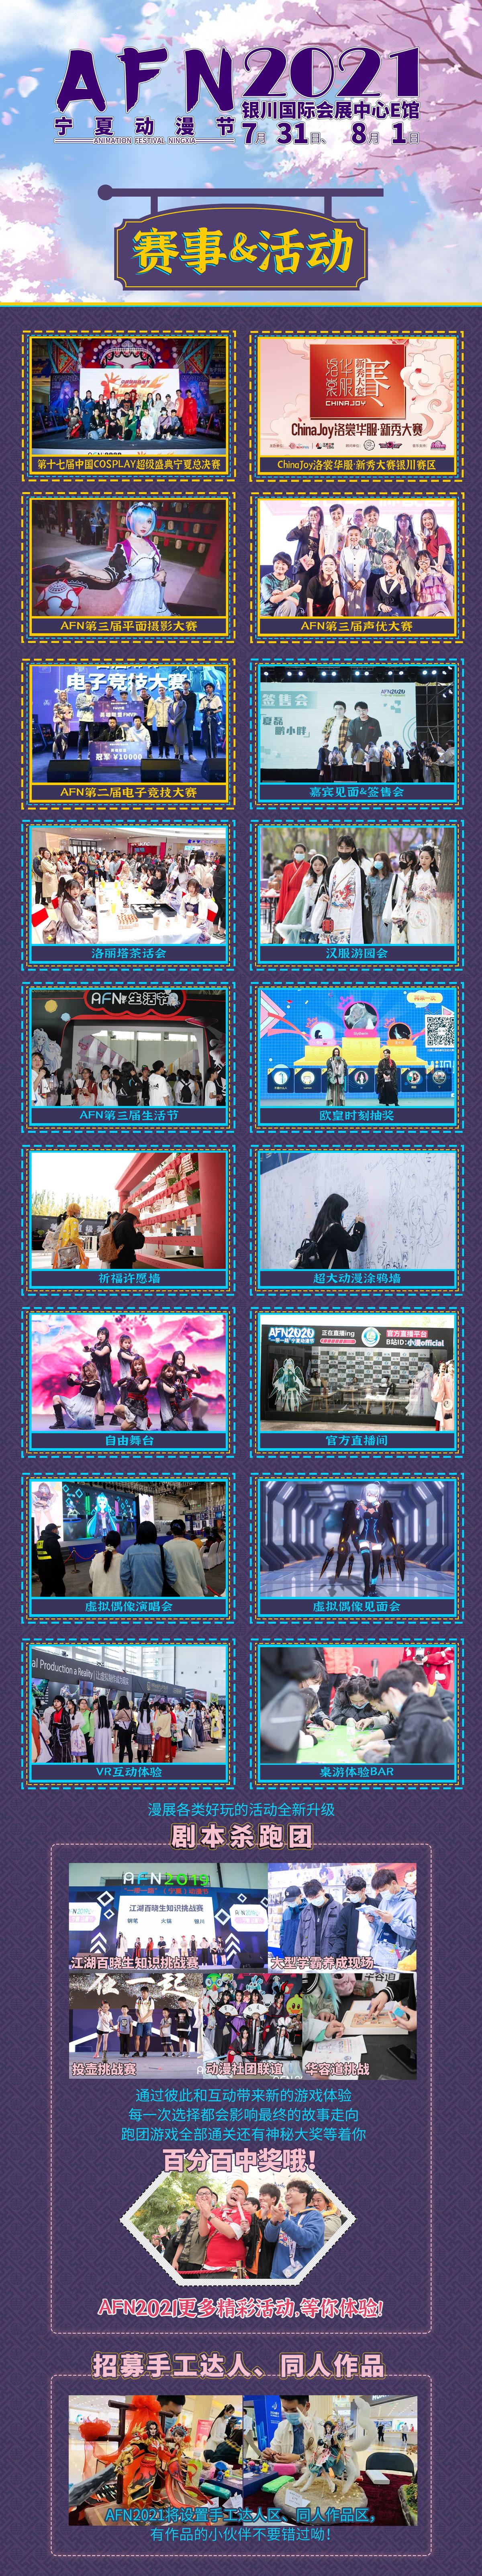 "AFN2021""一带一路""宁夏动漫节定档7月31日-8月1日"